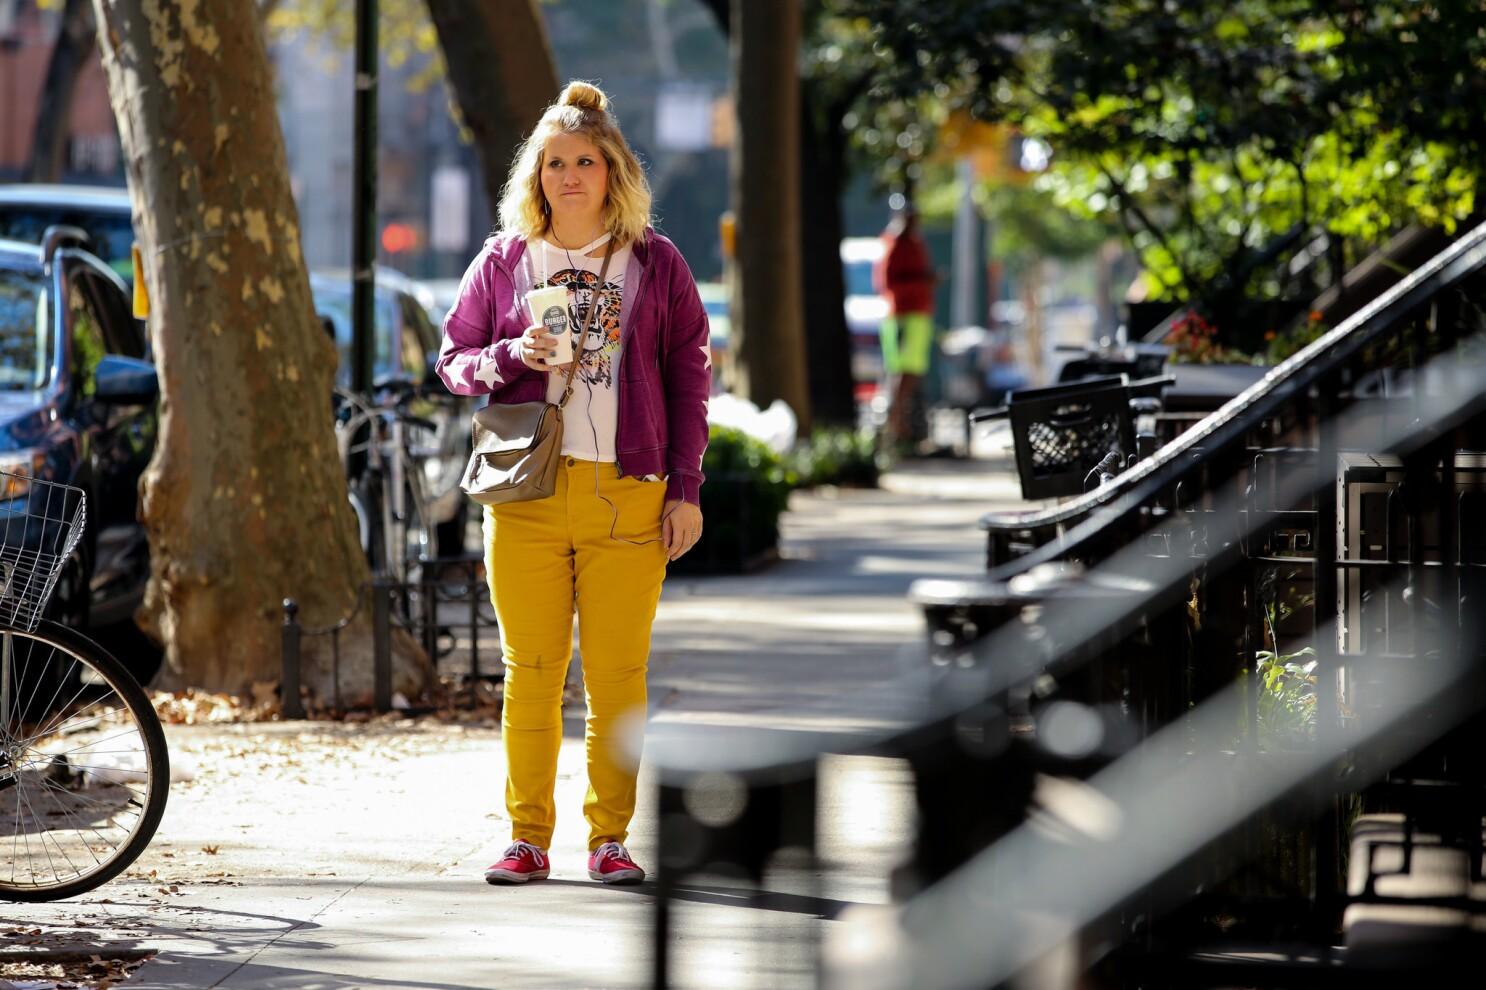 New movies opening in LA: 'Brittany Runs a Marathon,' 'Angel Has Fallen'